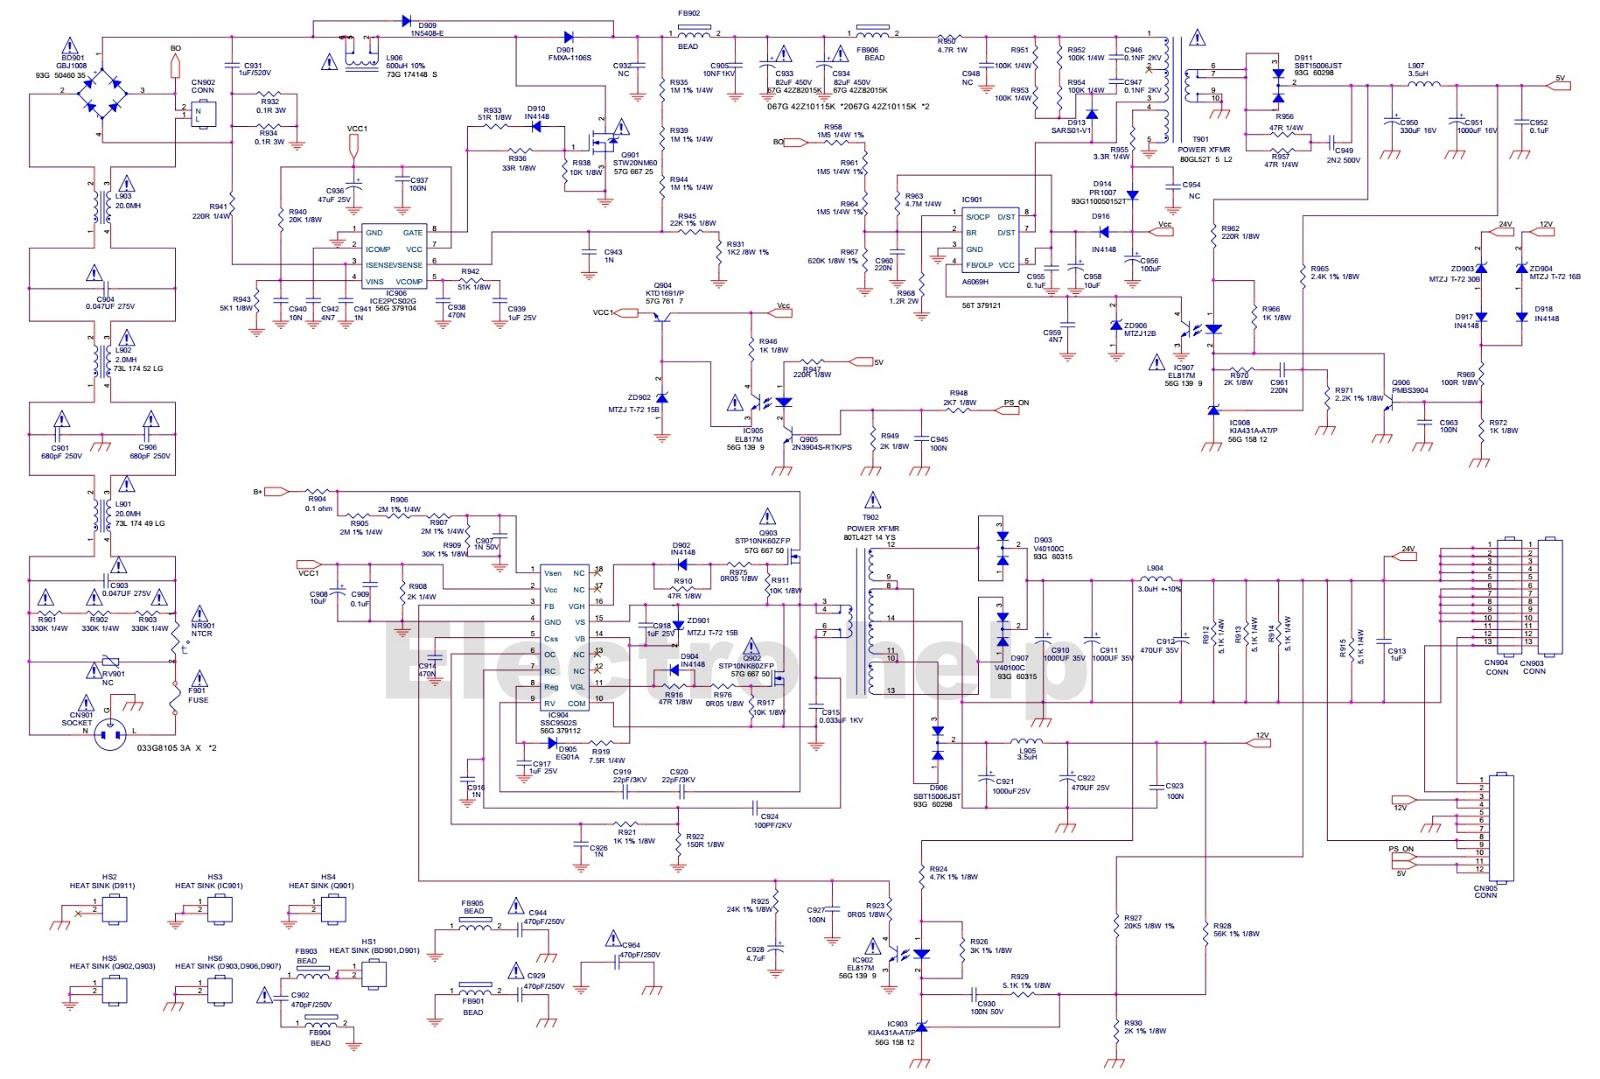 vizio tv wiring diagram vizio sv370 wiring diagram #1